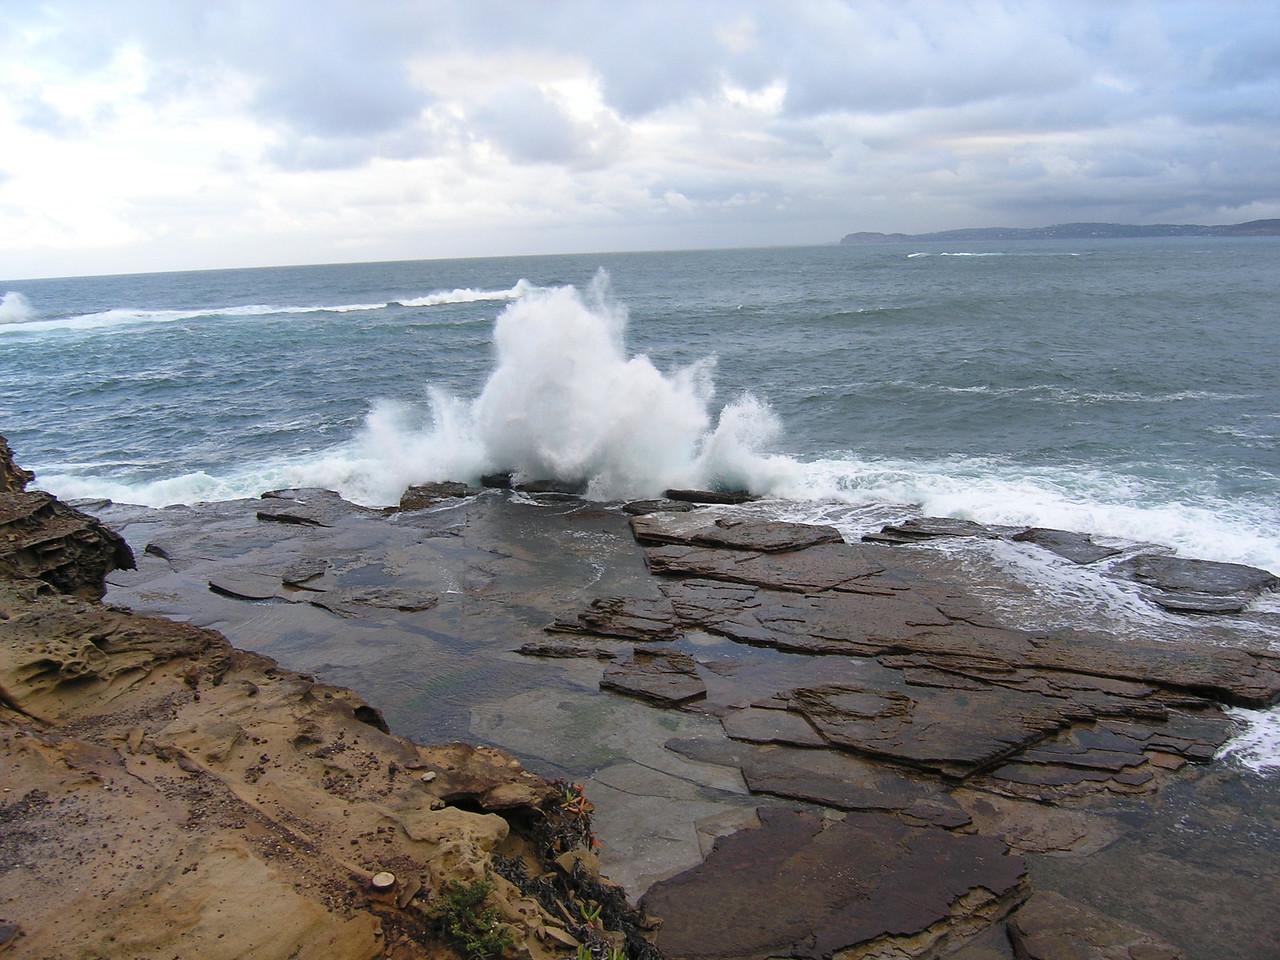 Waves near Wamberal